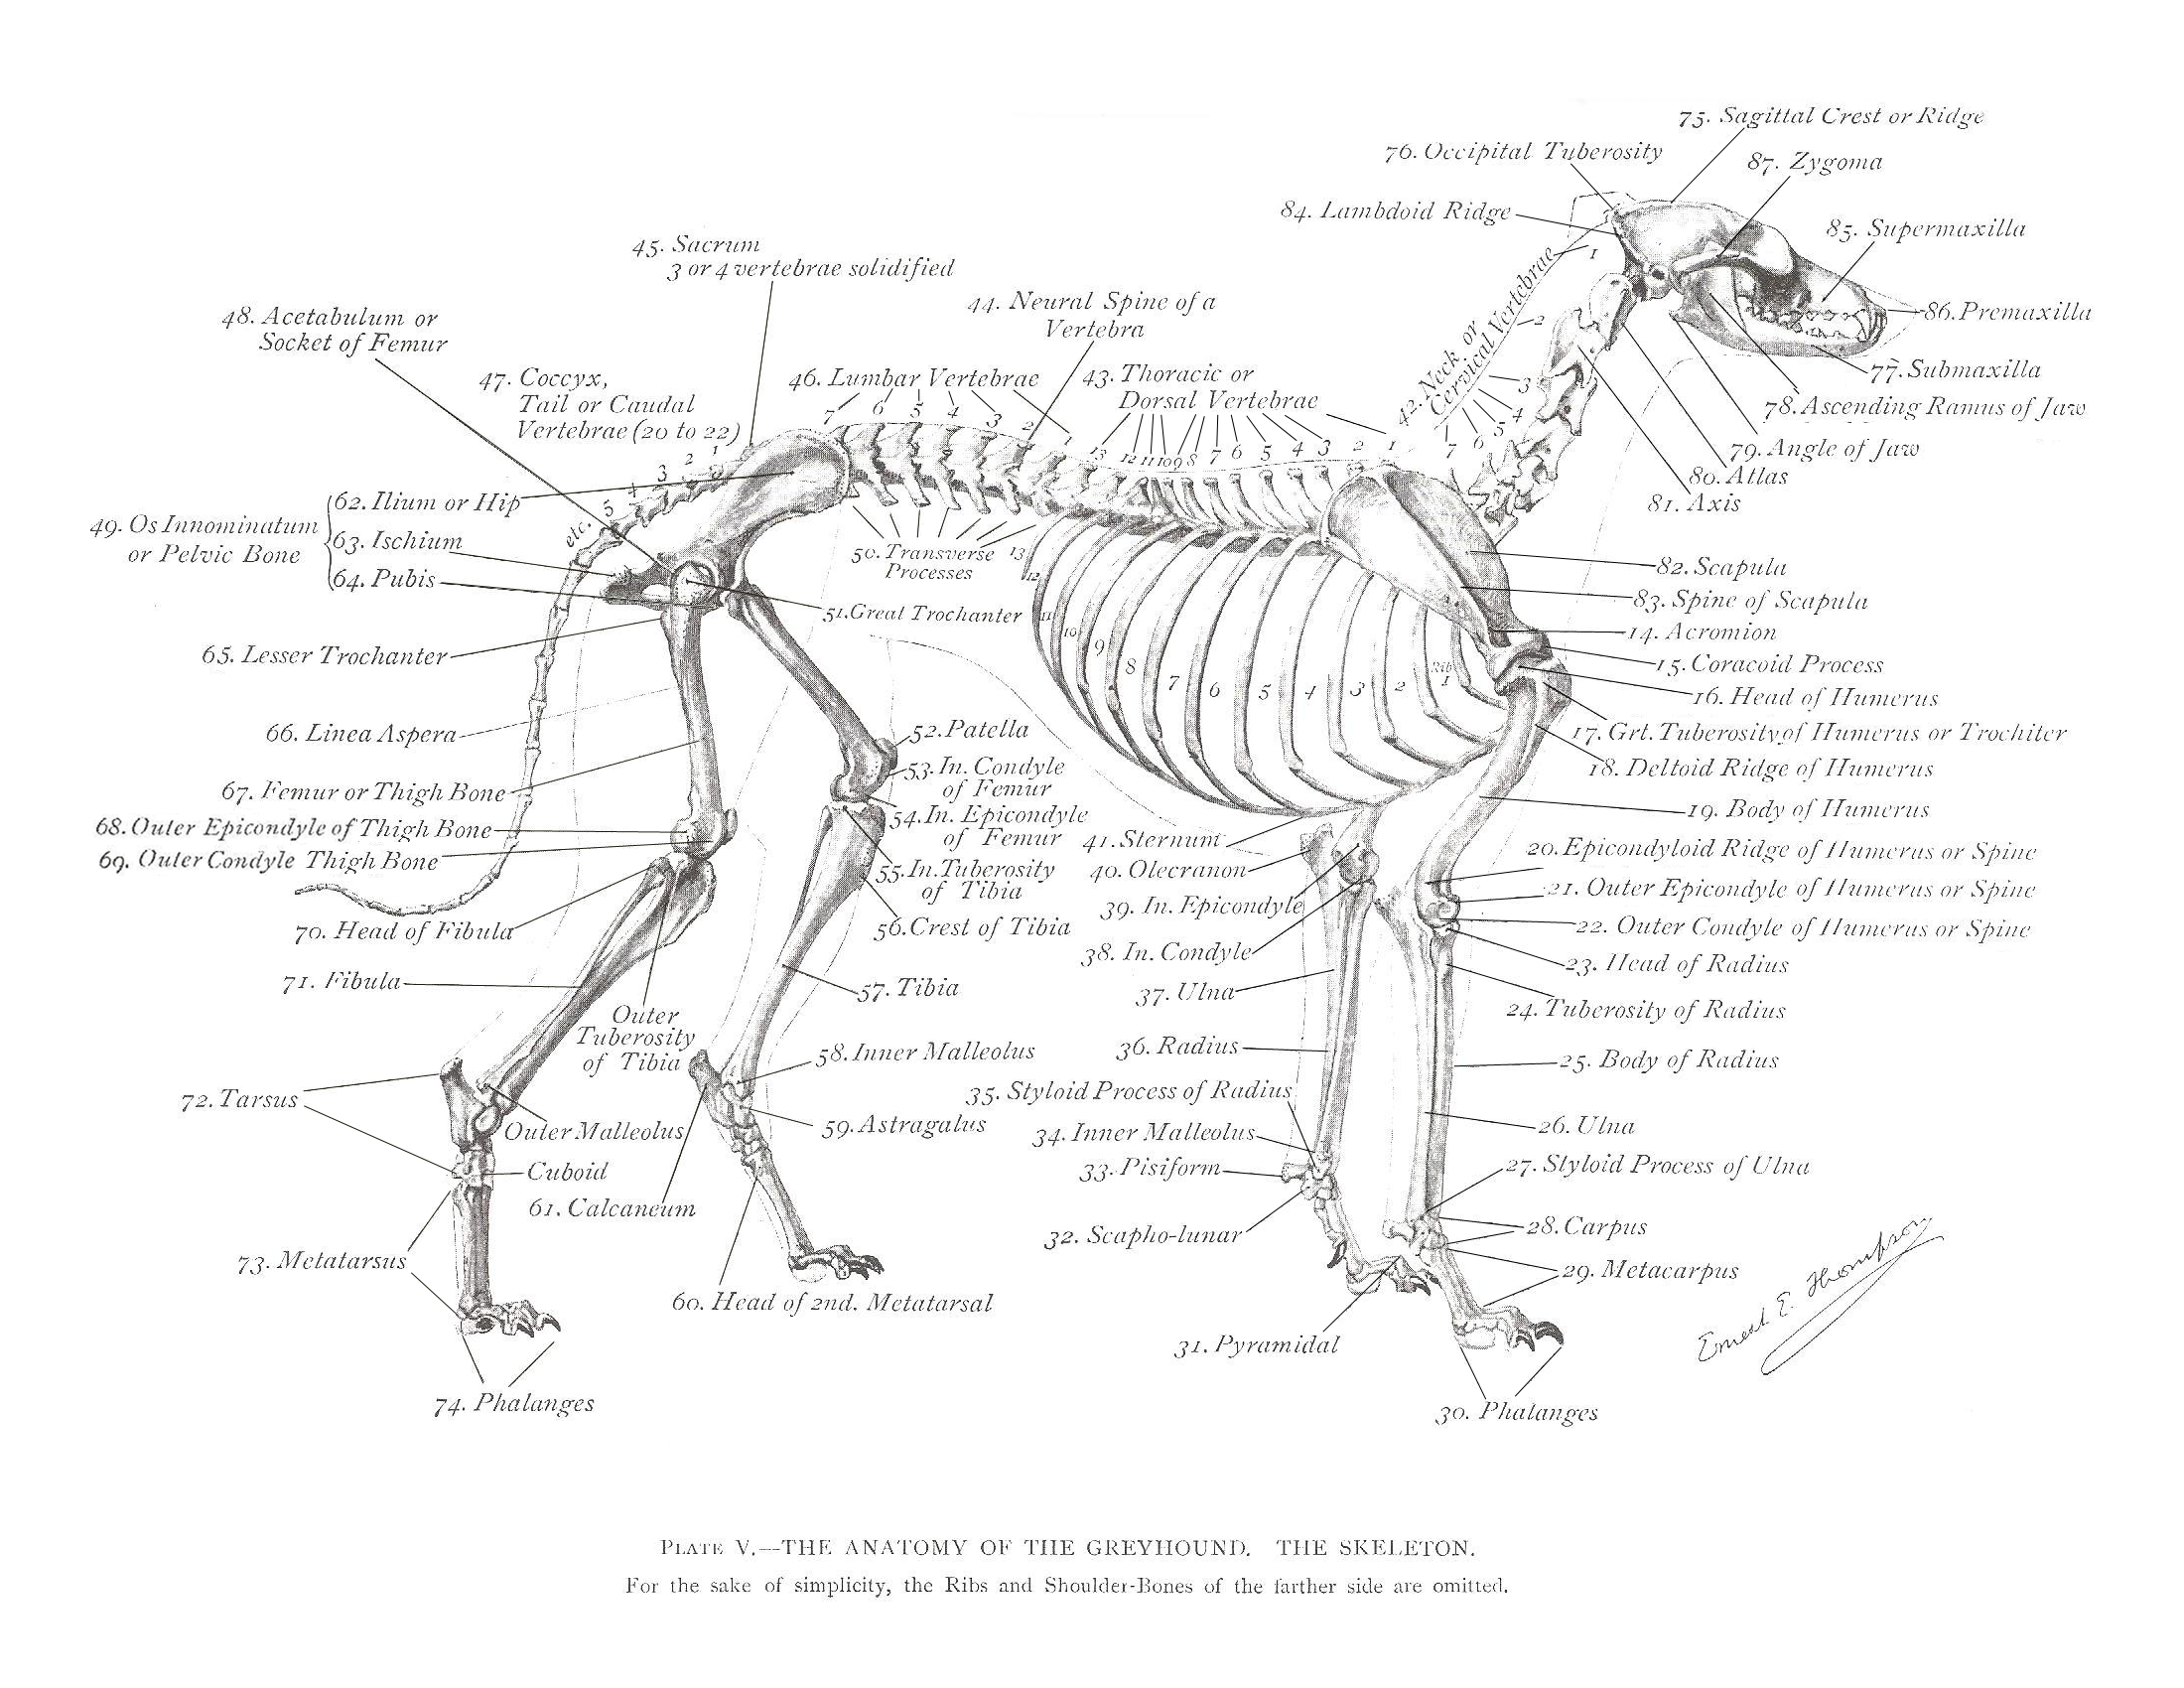 Dog Bone Diagram S Plan Wiring With Pump Overrun Greyhound Anatomy The Skeleton Click Link